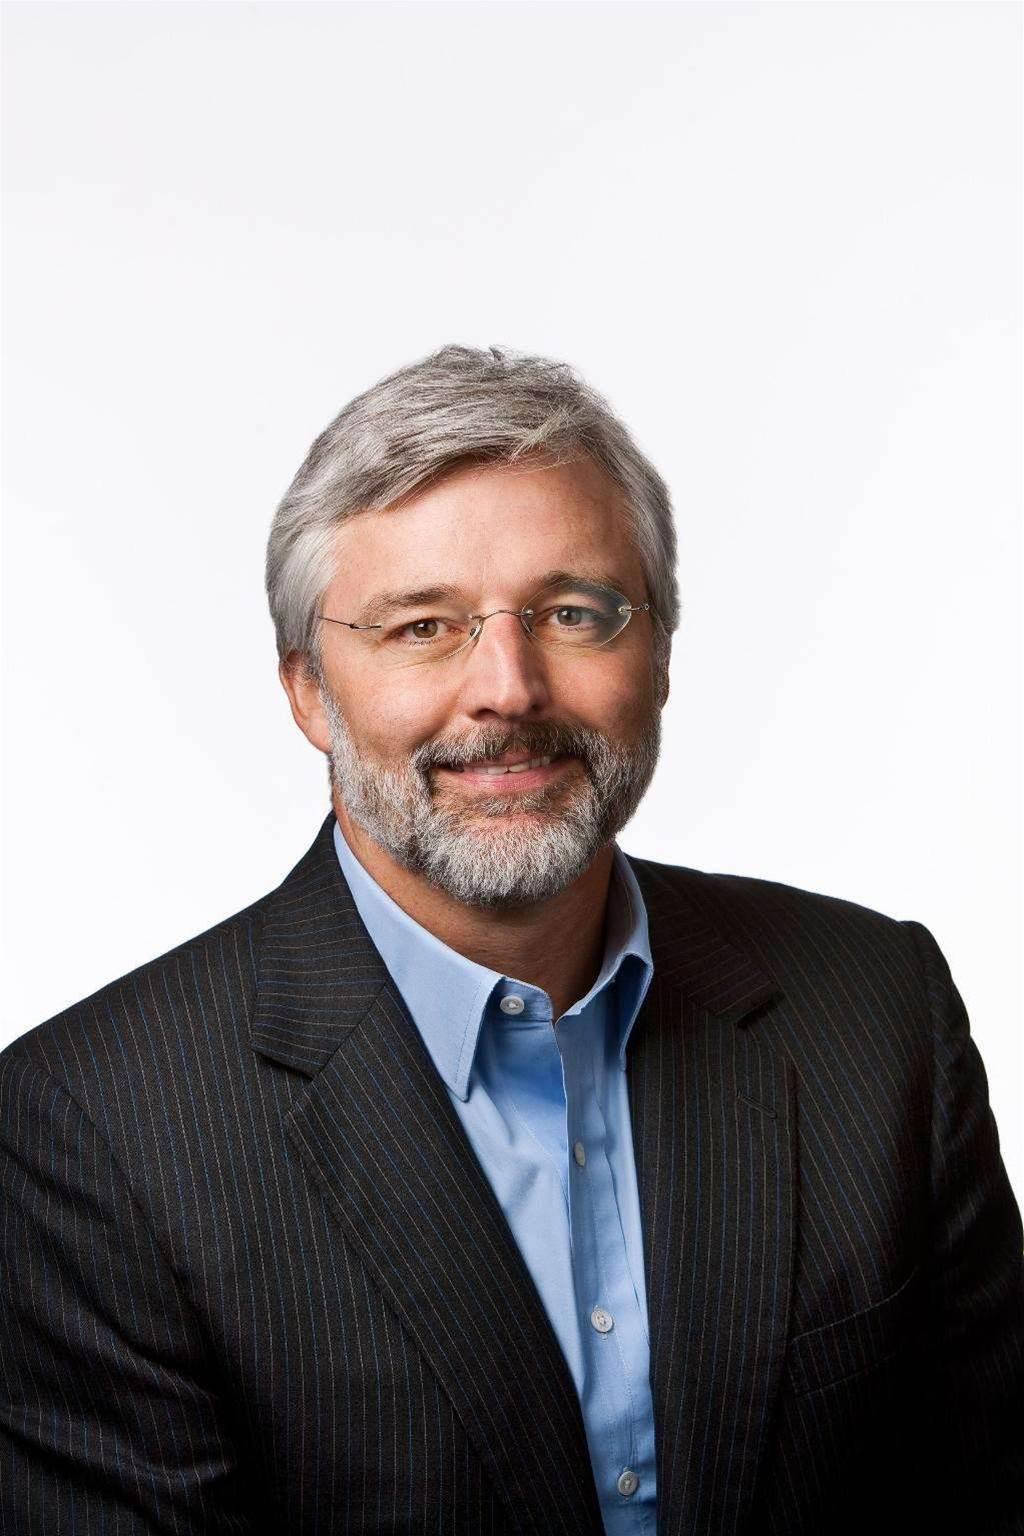 Decoding NetSuite's anti-SAP bravado